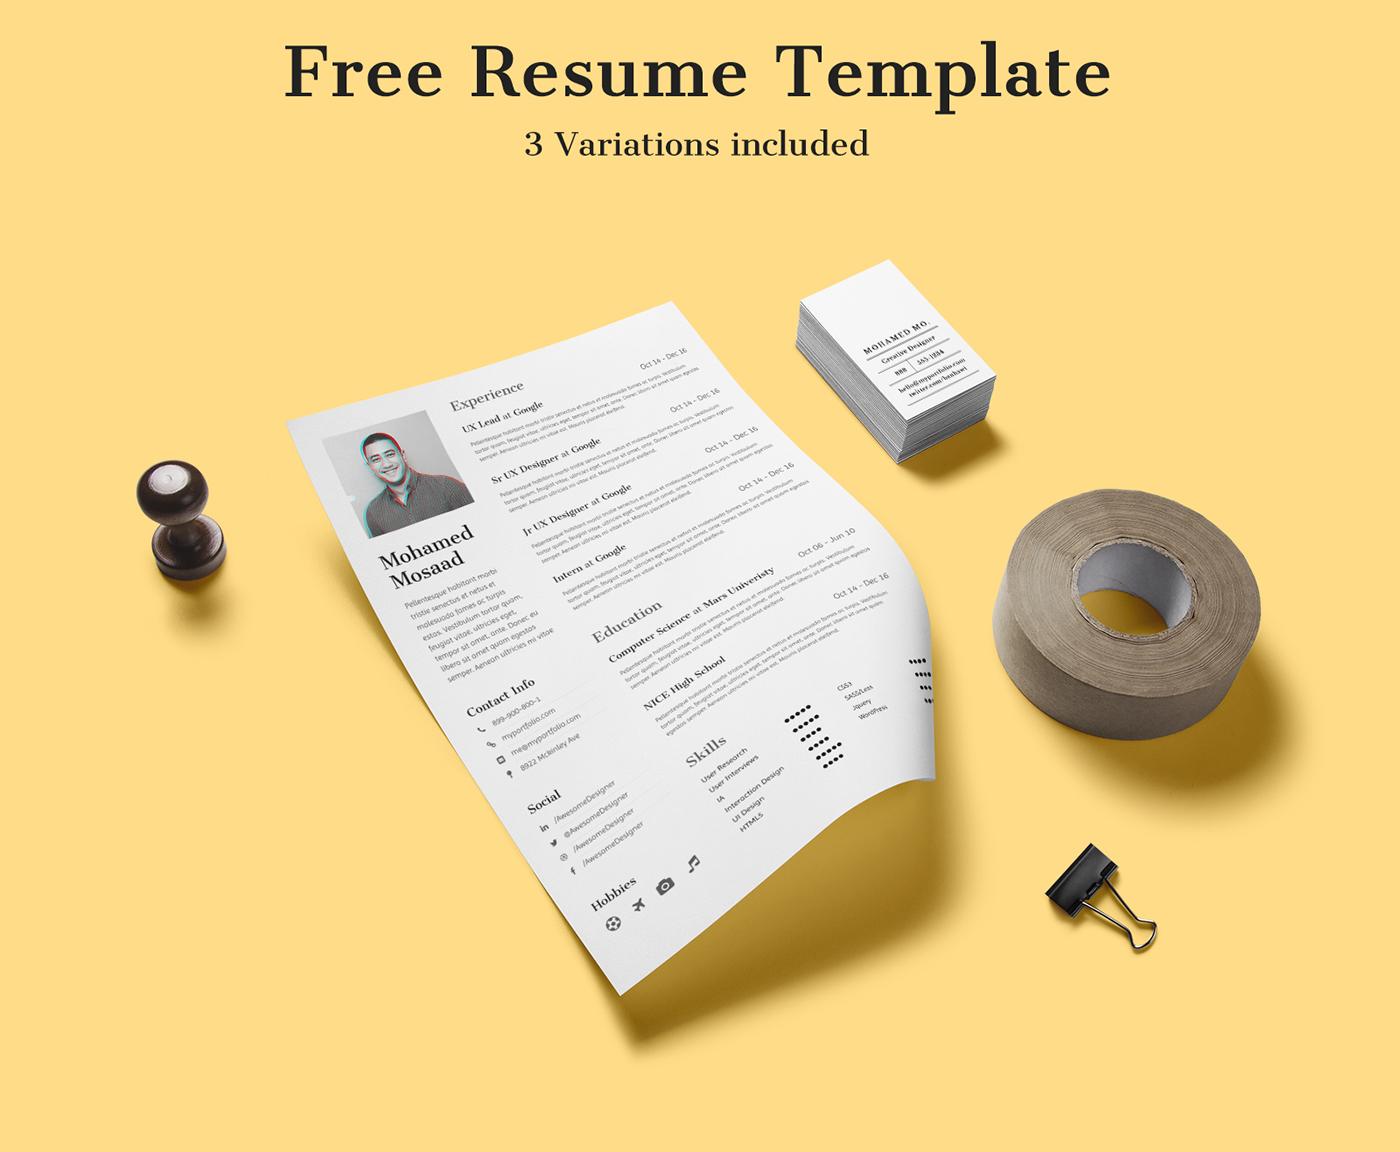 clean minimal Resume CV freebie Curriculum Vita curriculum Vitae download